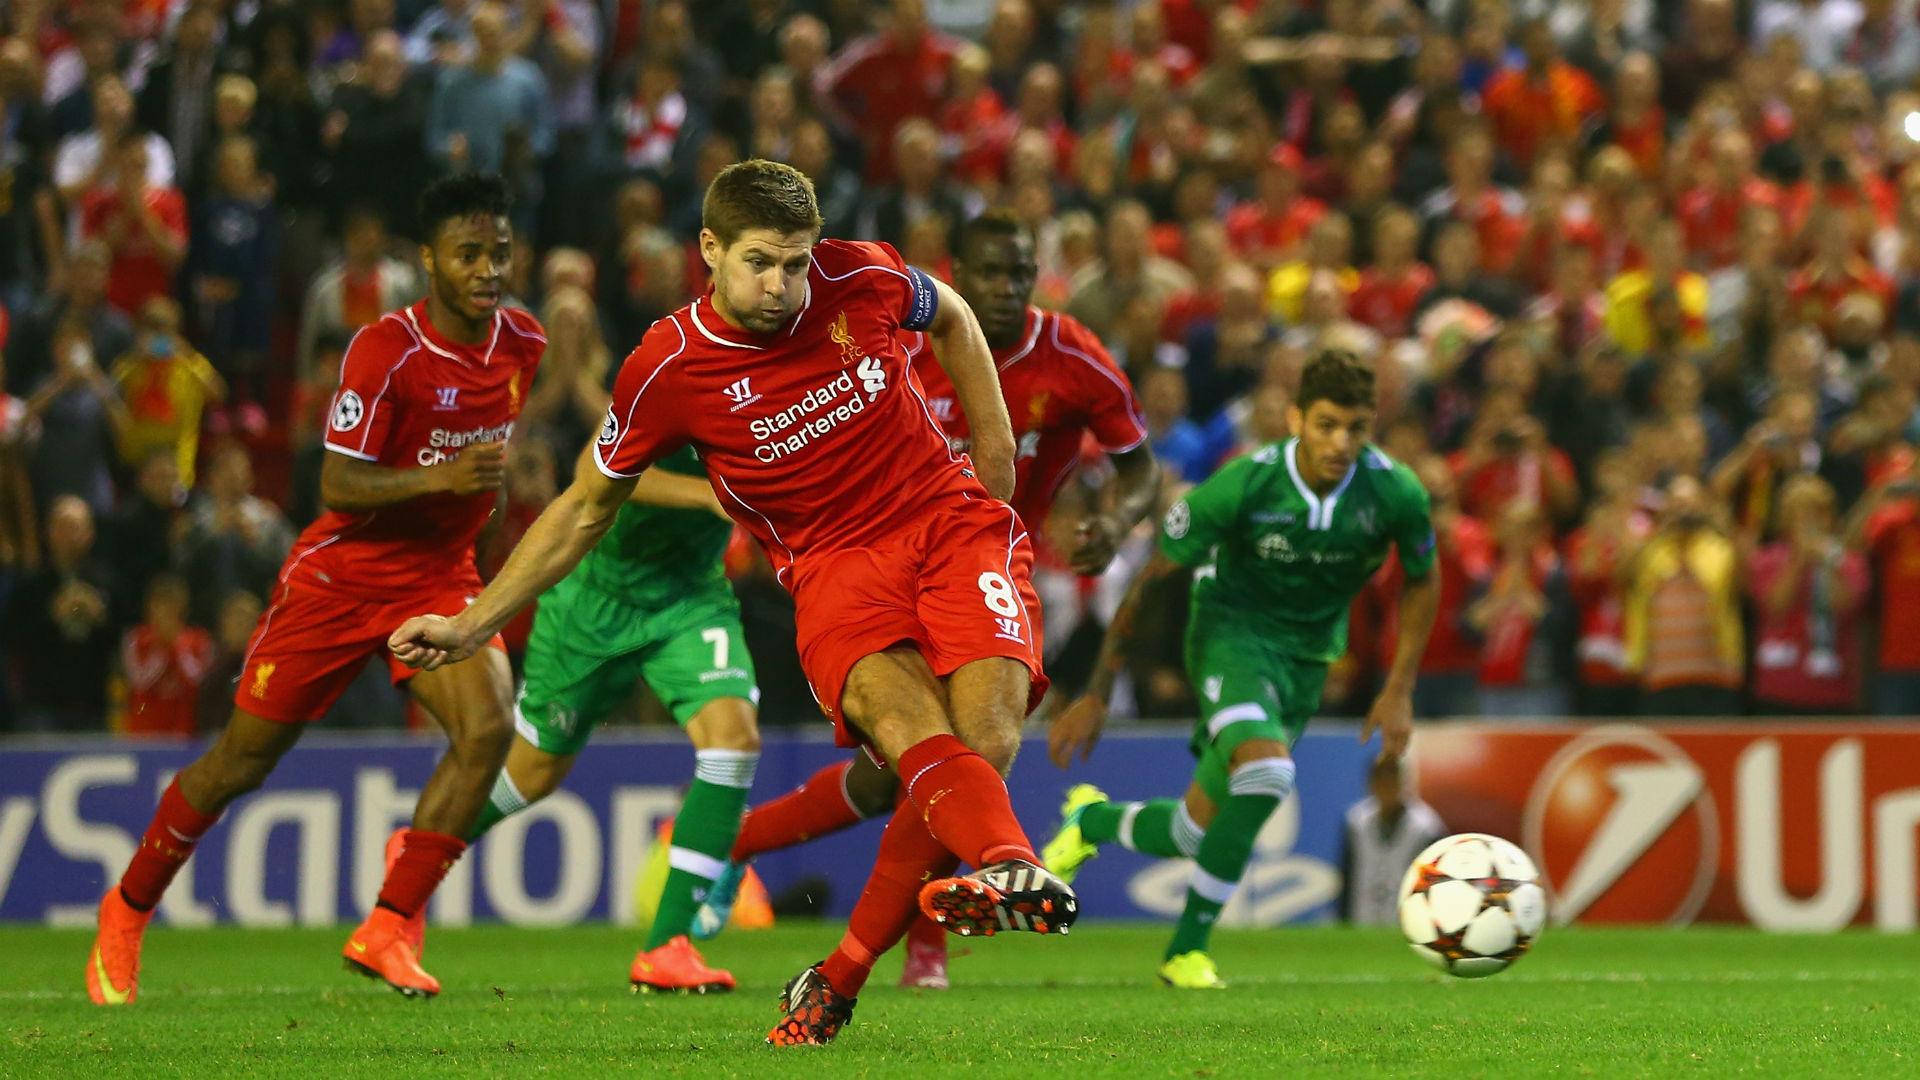 Steven Gerrard Champions League Liverpool v Ludogorets